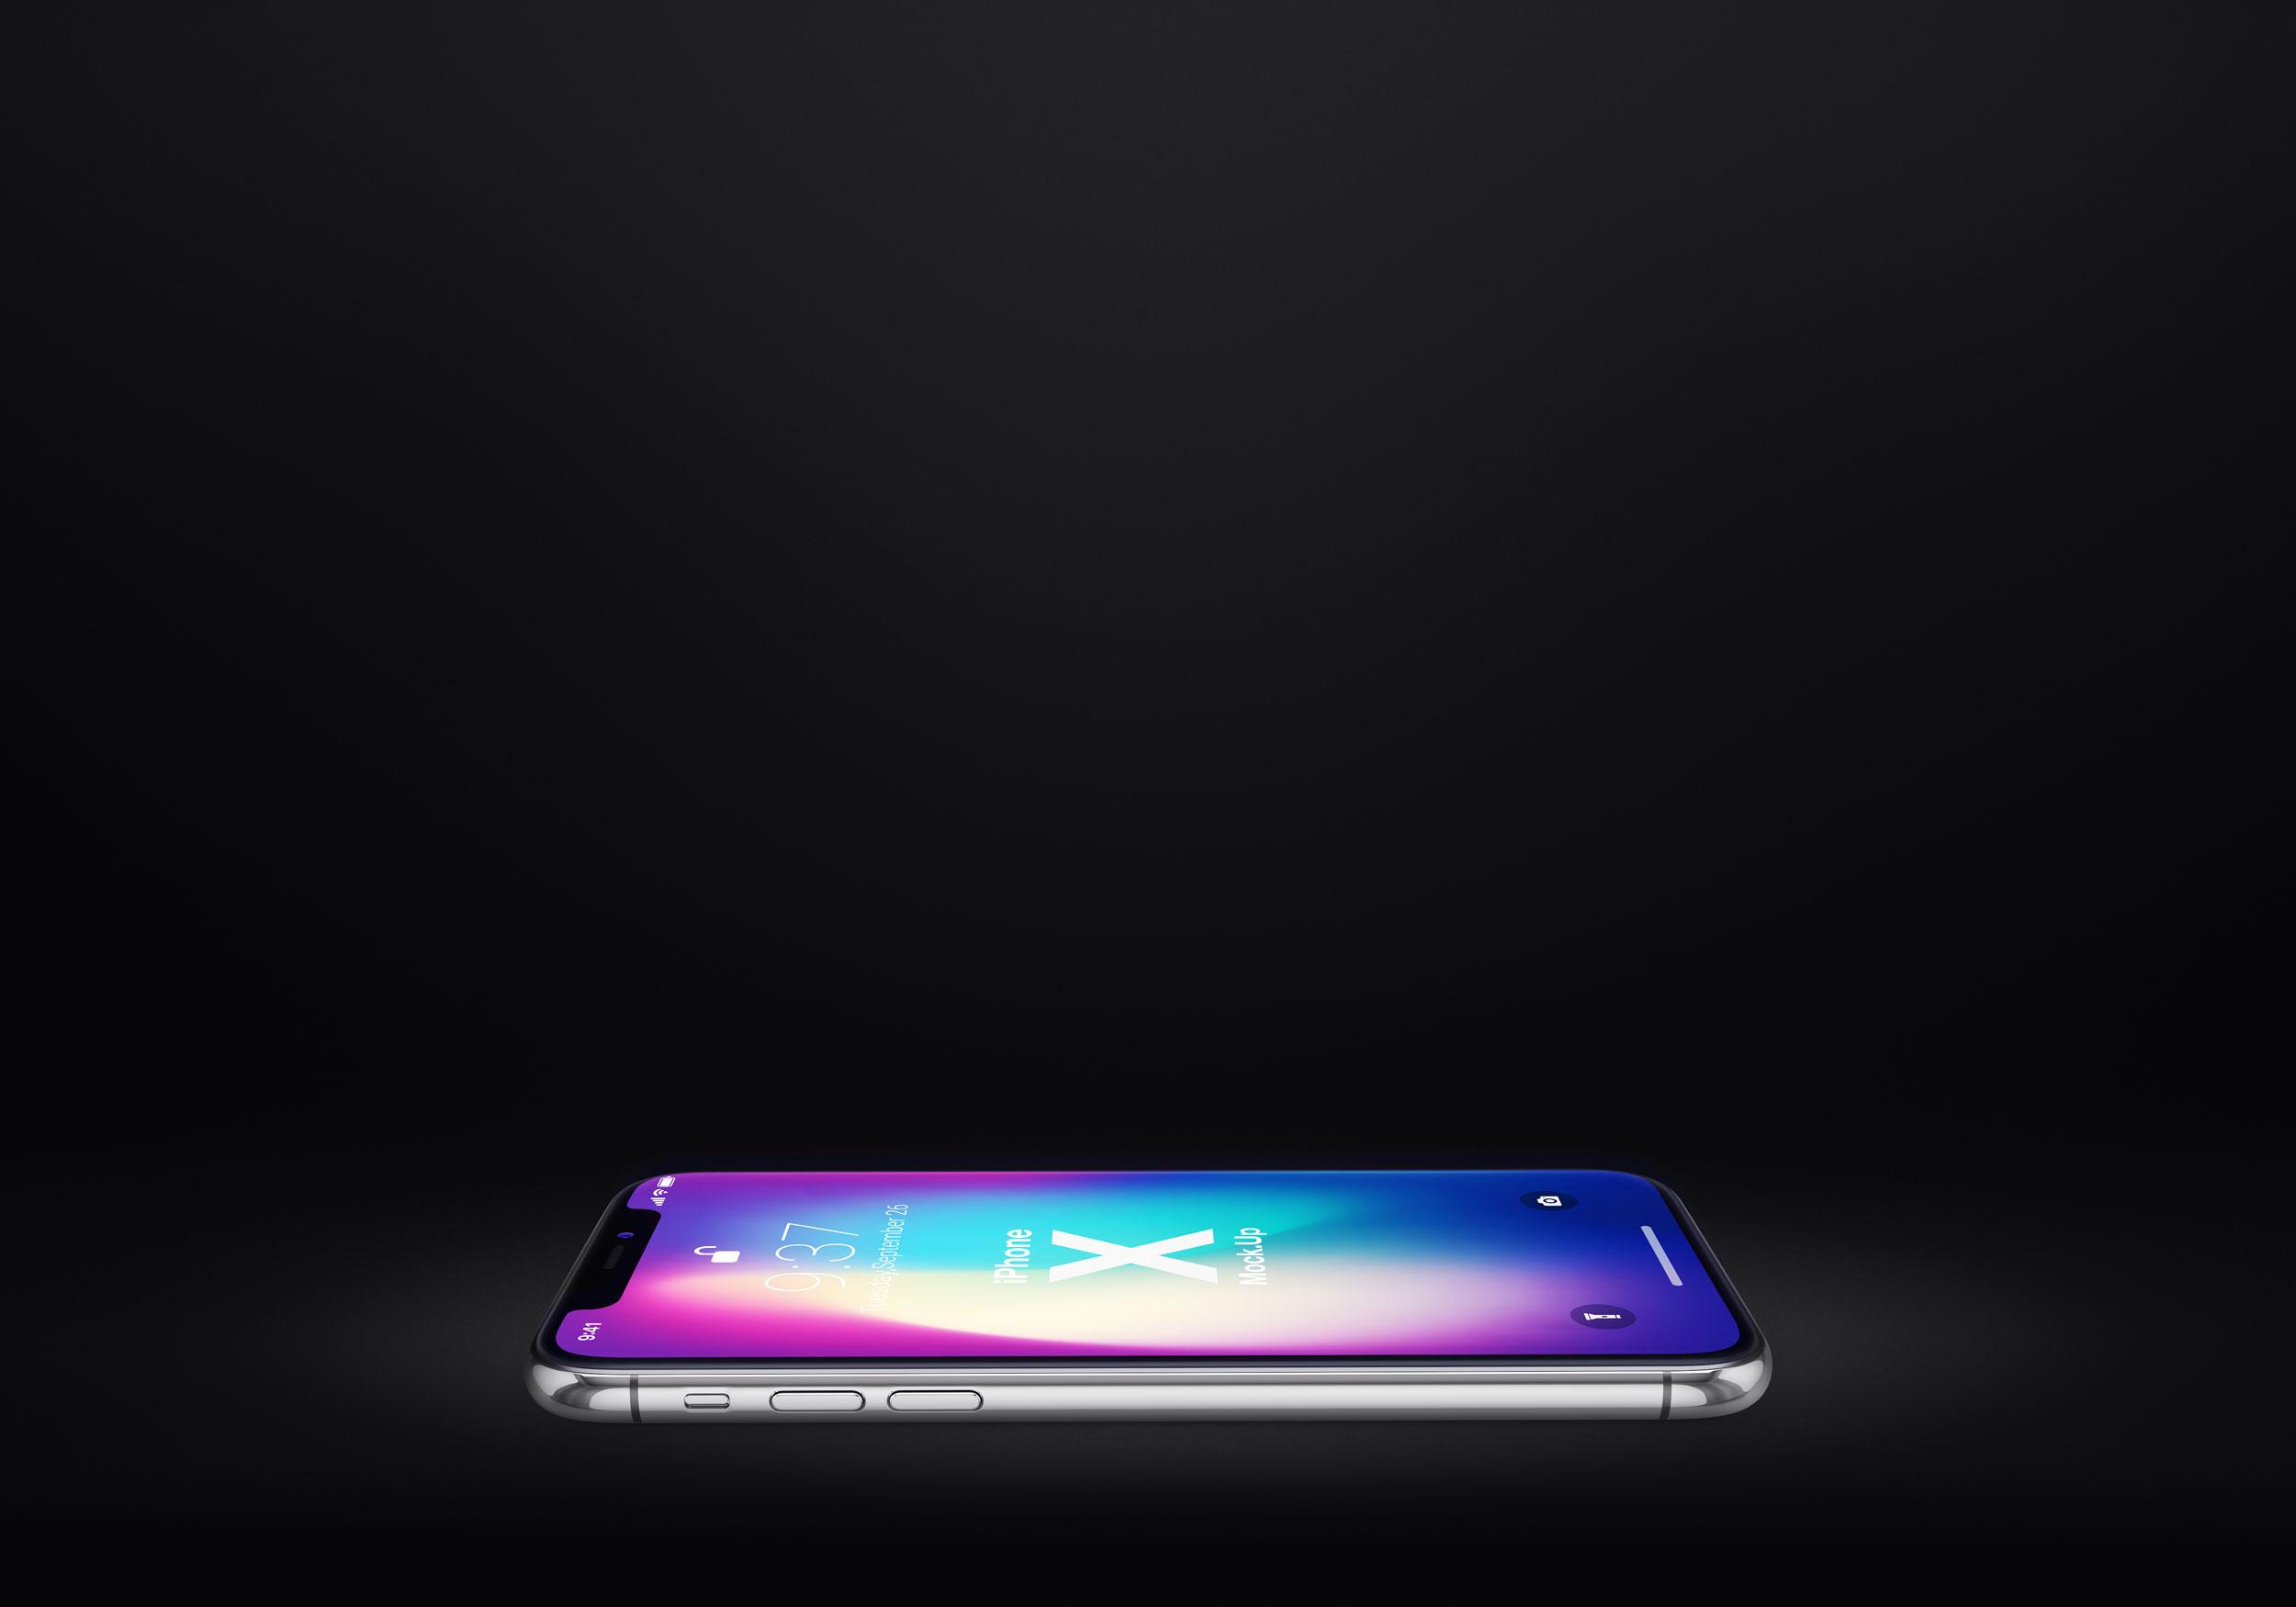 46b886a7cfc9b5a - 苹果iPhoneX UI样机